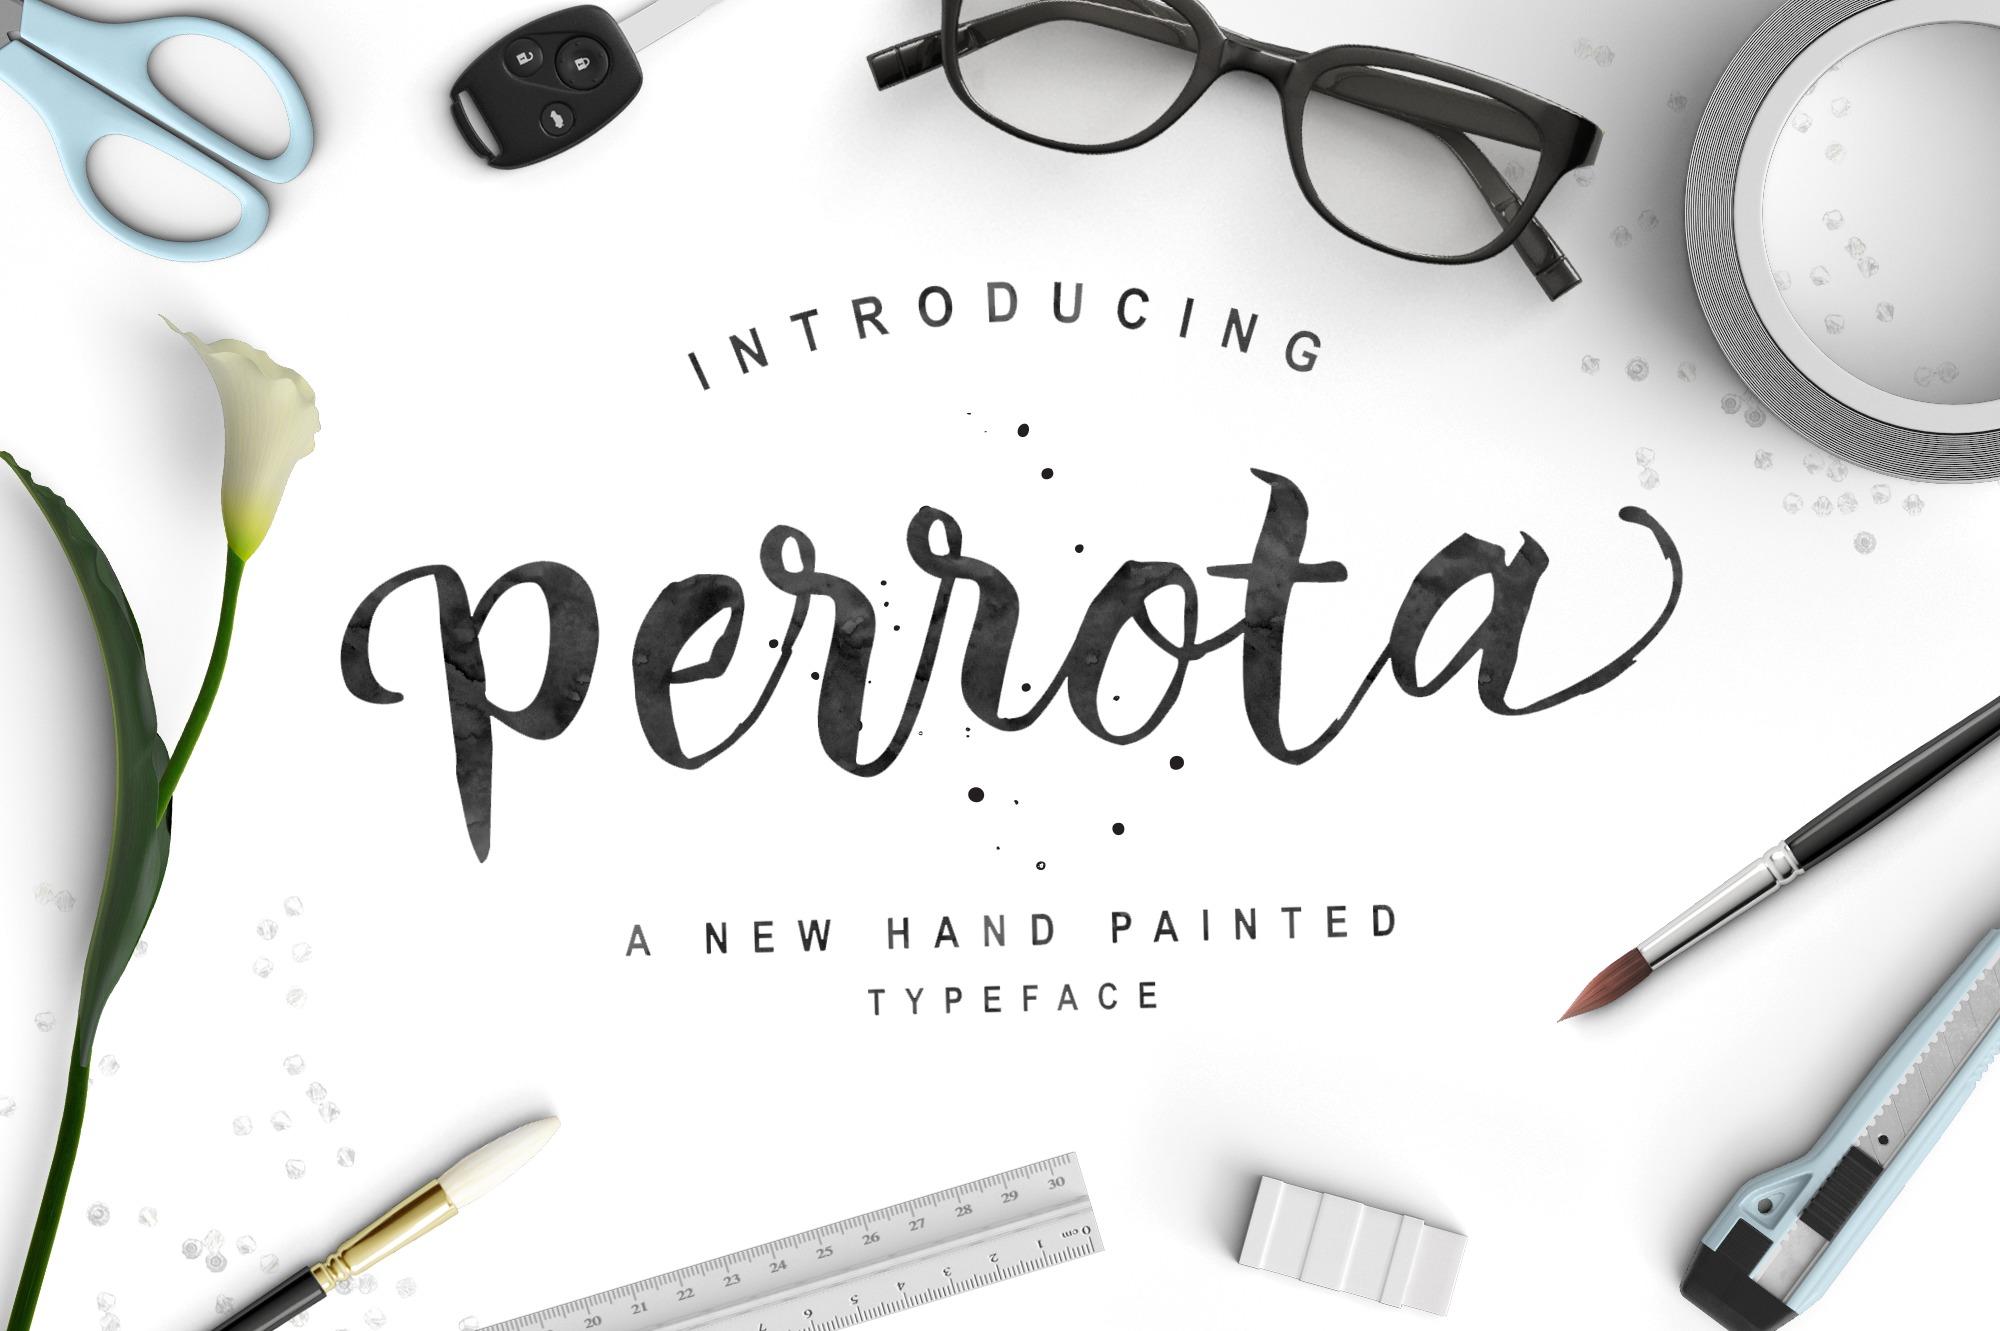 Perrota-Typeface-Handmade-Calligraphy